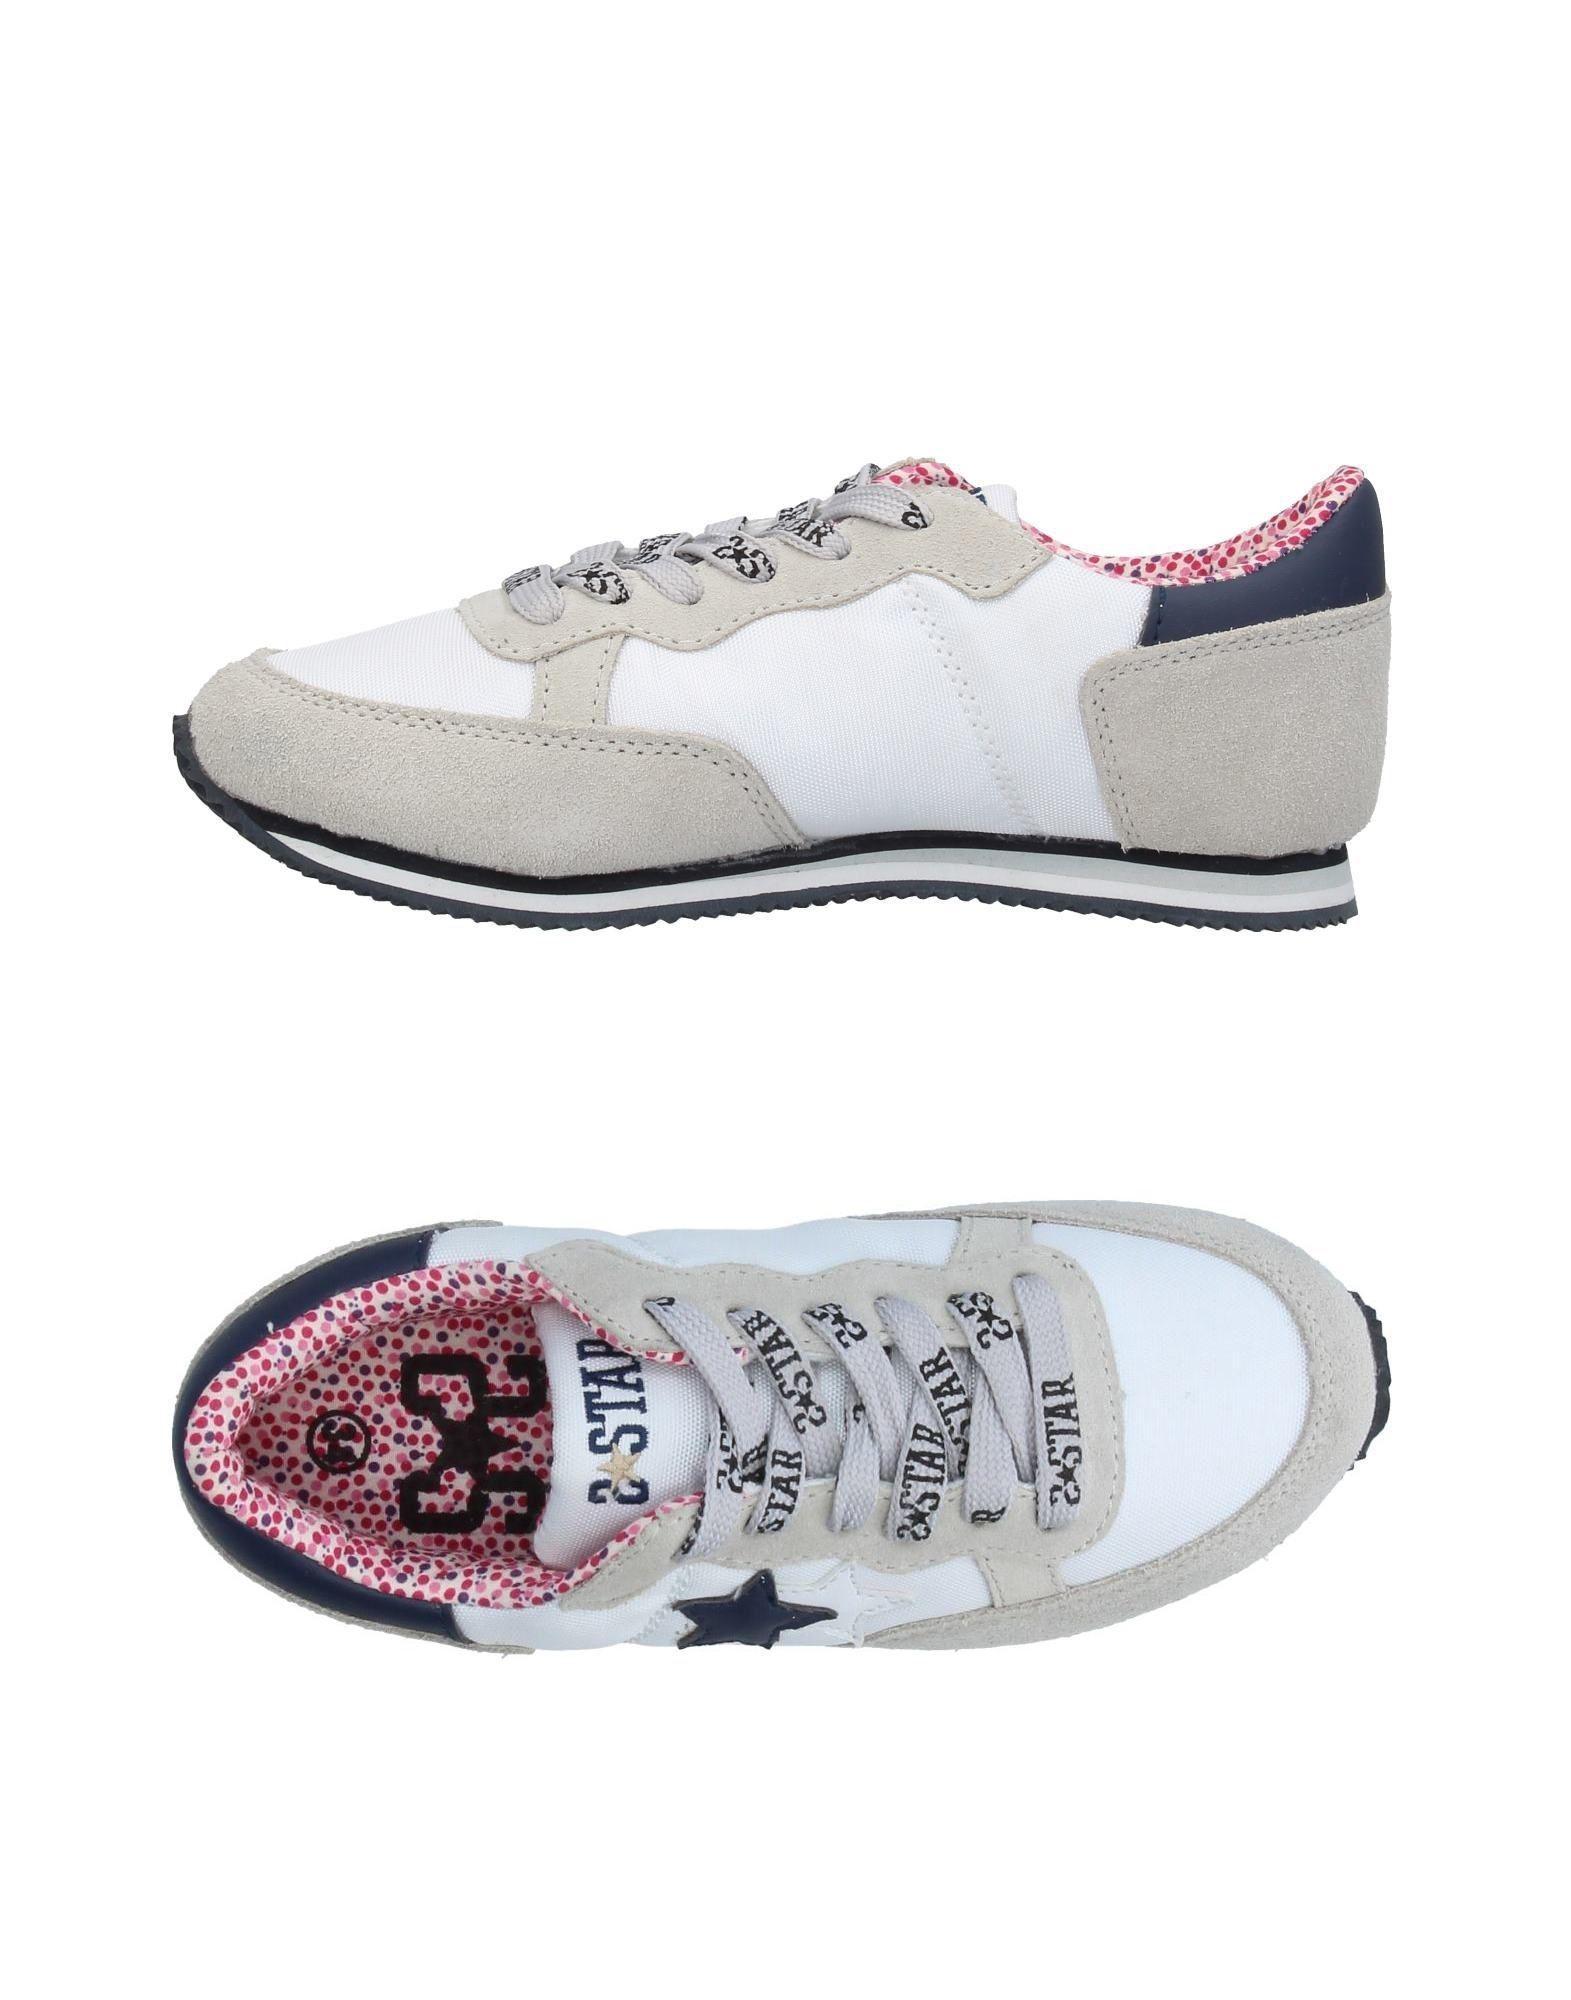 FOOTWEAR - Low-tops & sneakers 2Star LOmB520